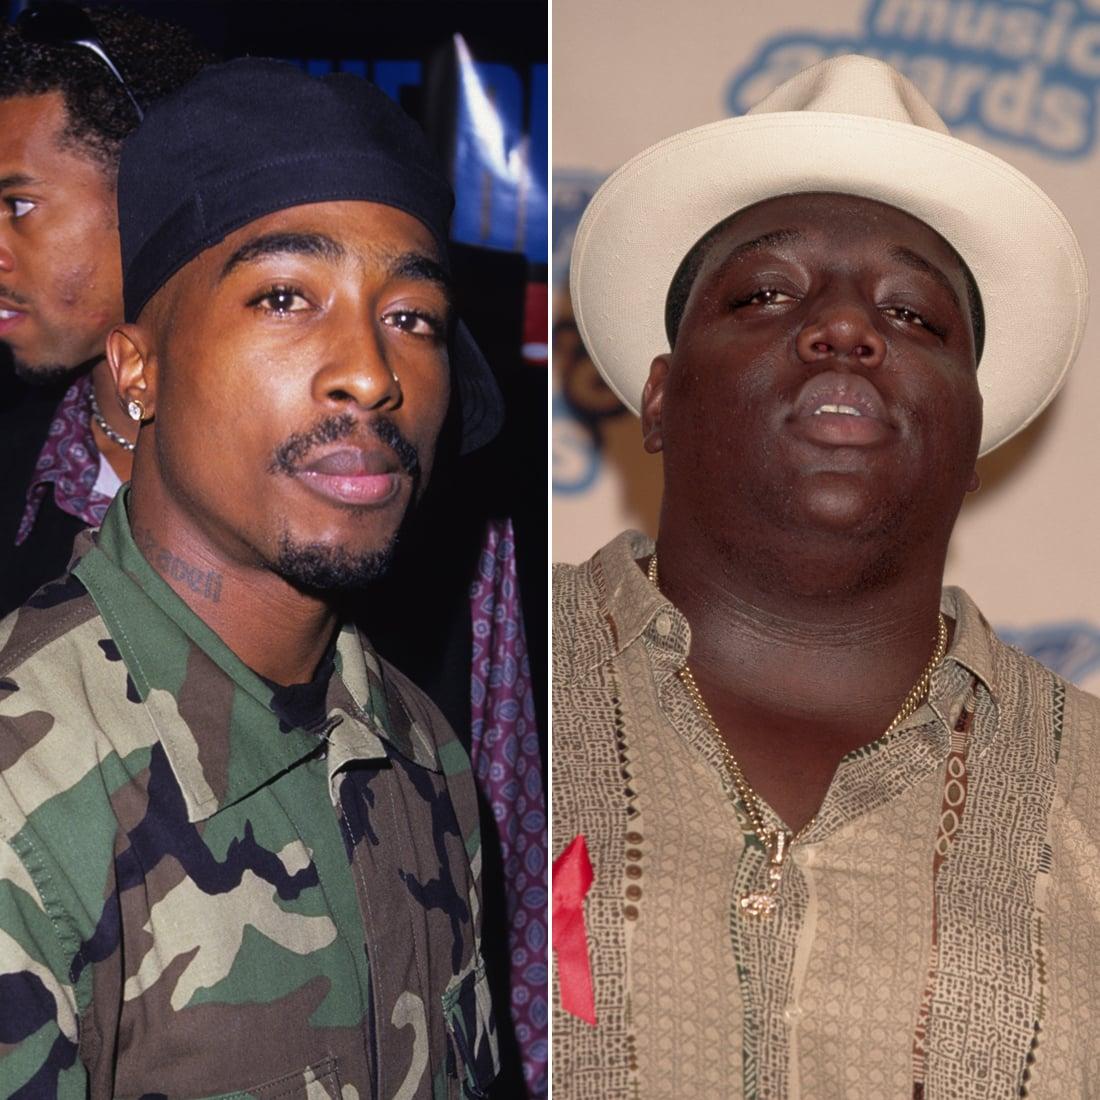 Were Tupac Shakur And Biggie Smalls Friends?